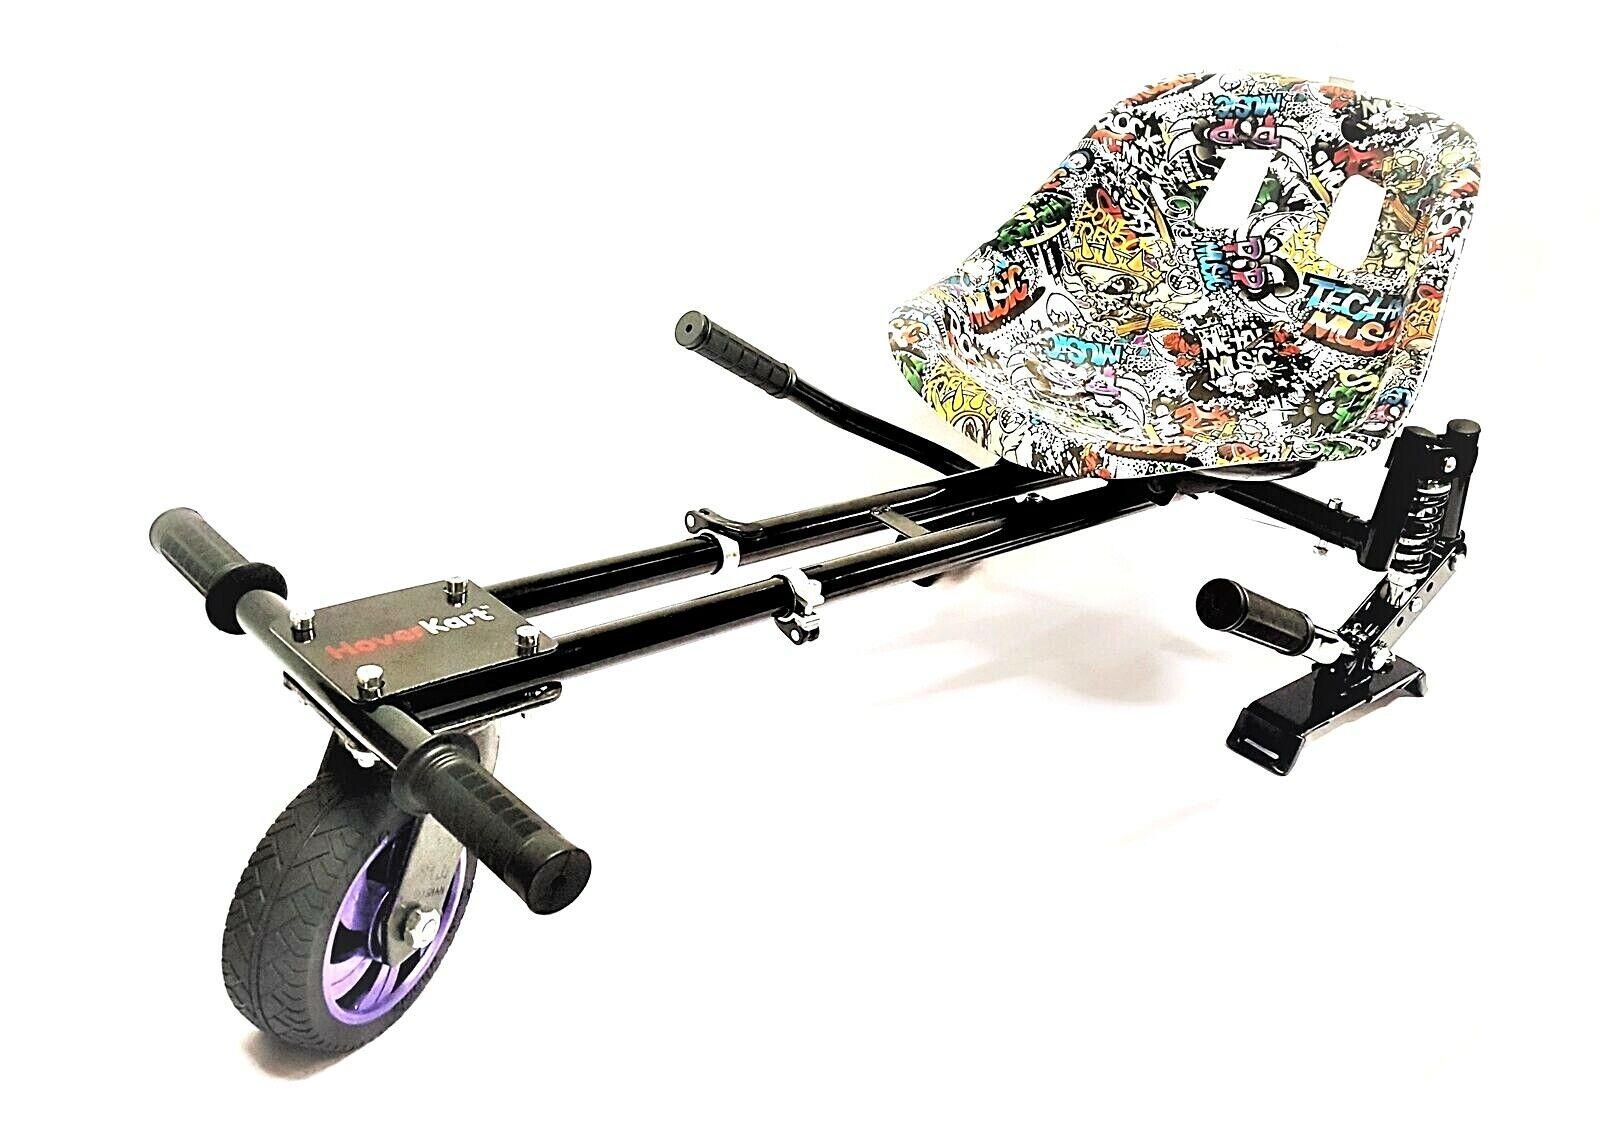 Musique Pop Suspension Original hoverkart convertir Hoverboard à Go Karts panier